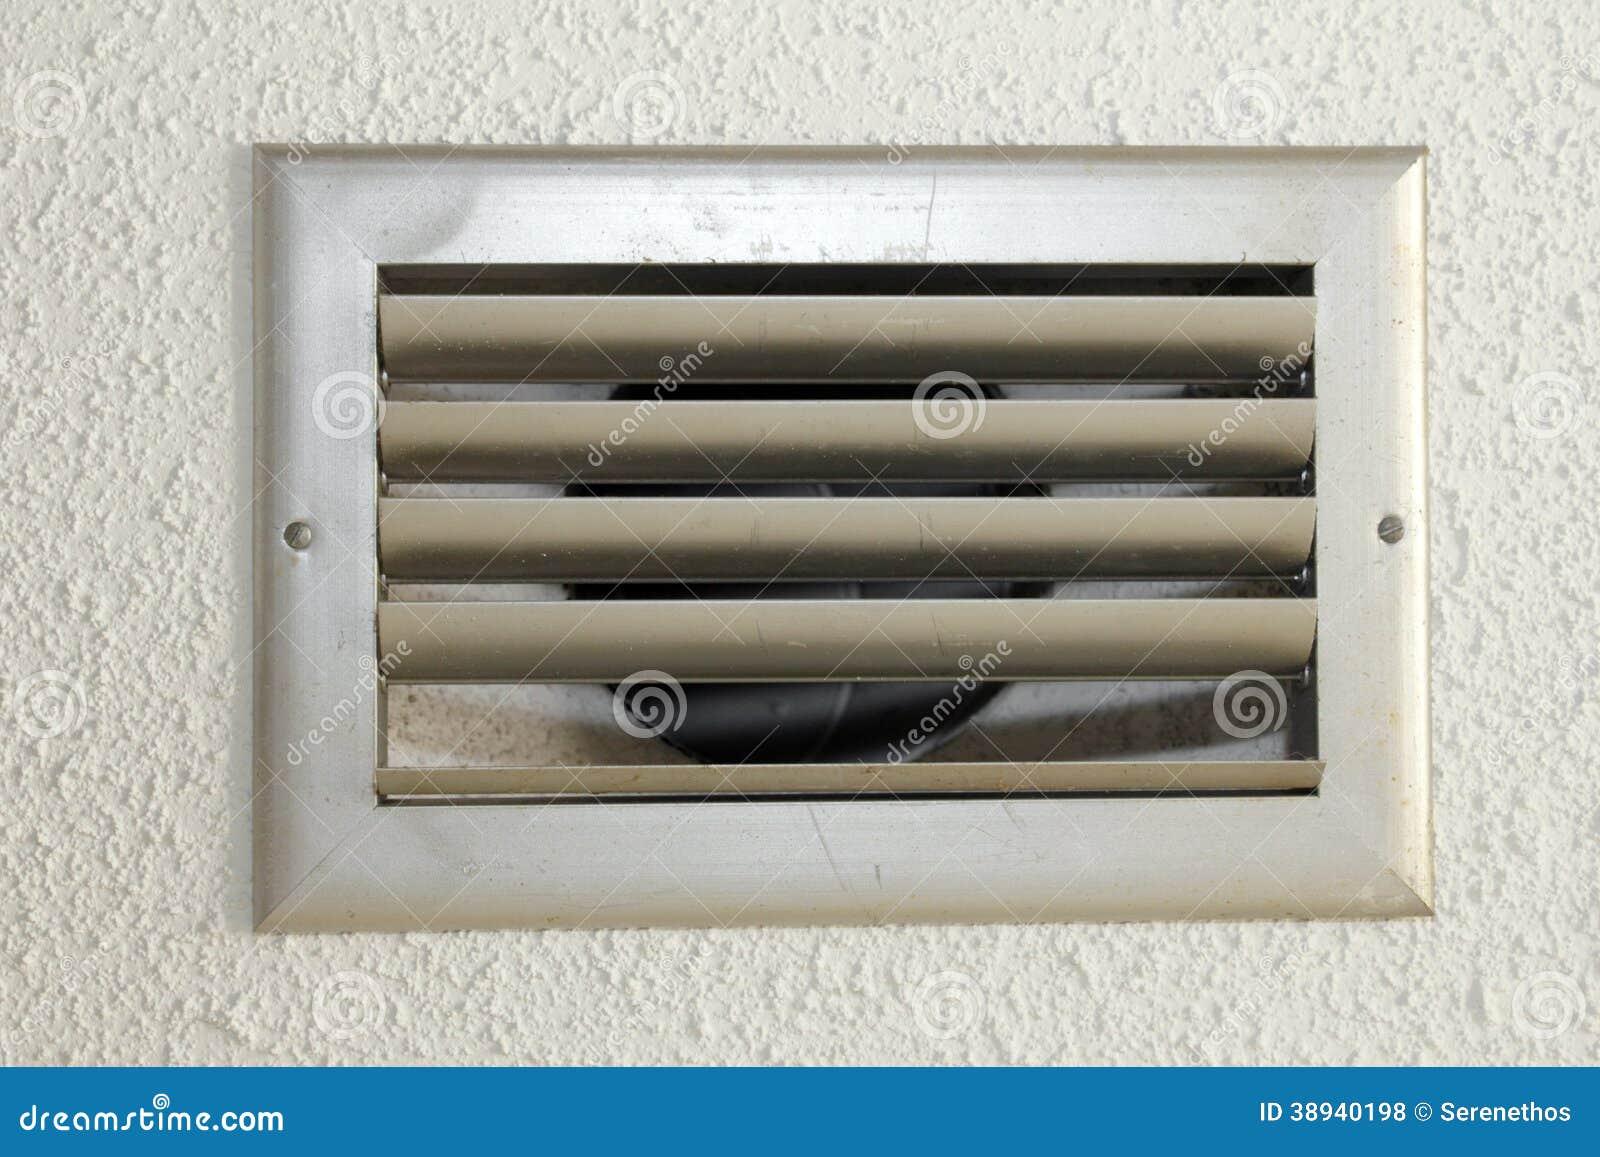 Webb Air Ventilator : Ceiling air vent stock photo image